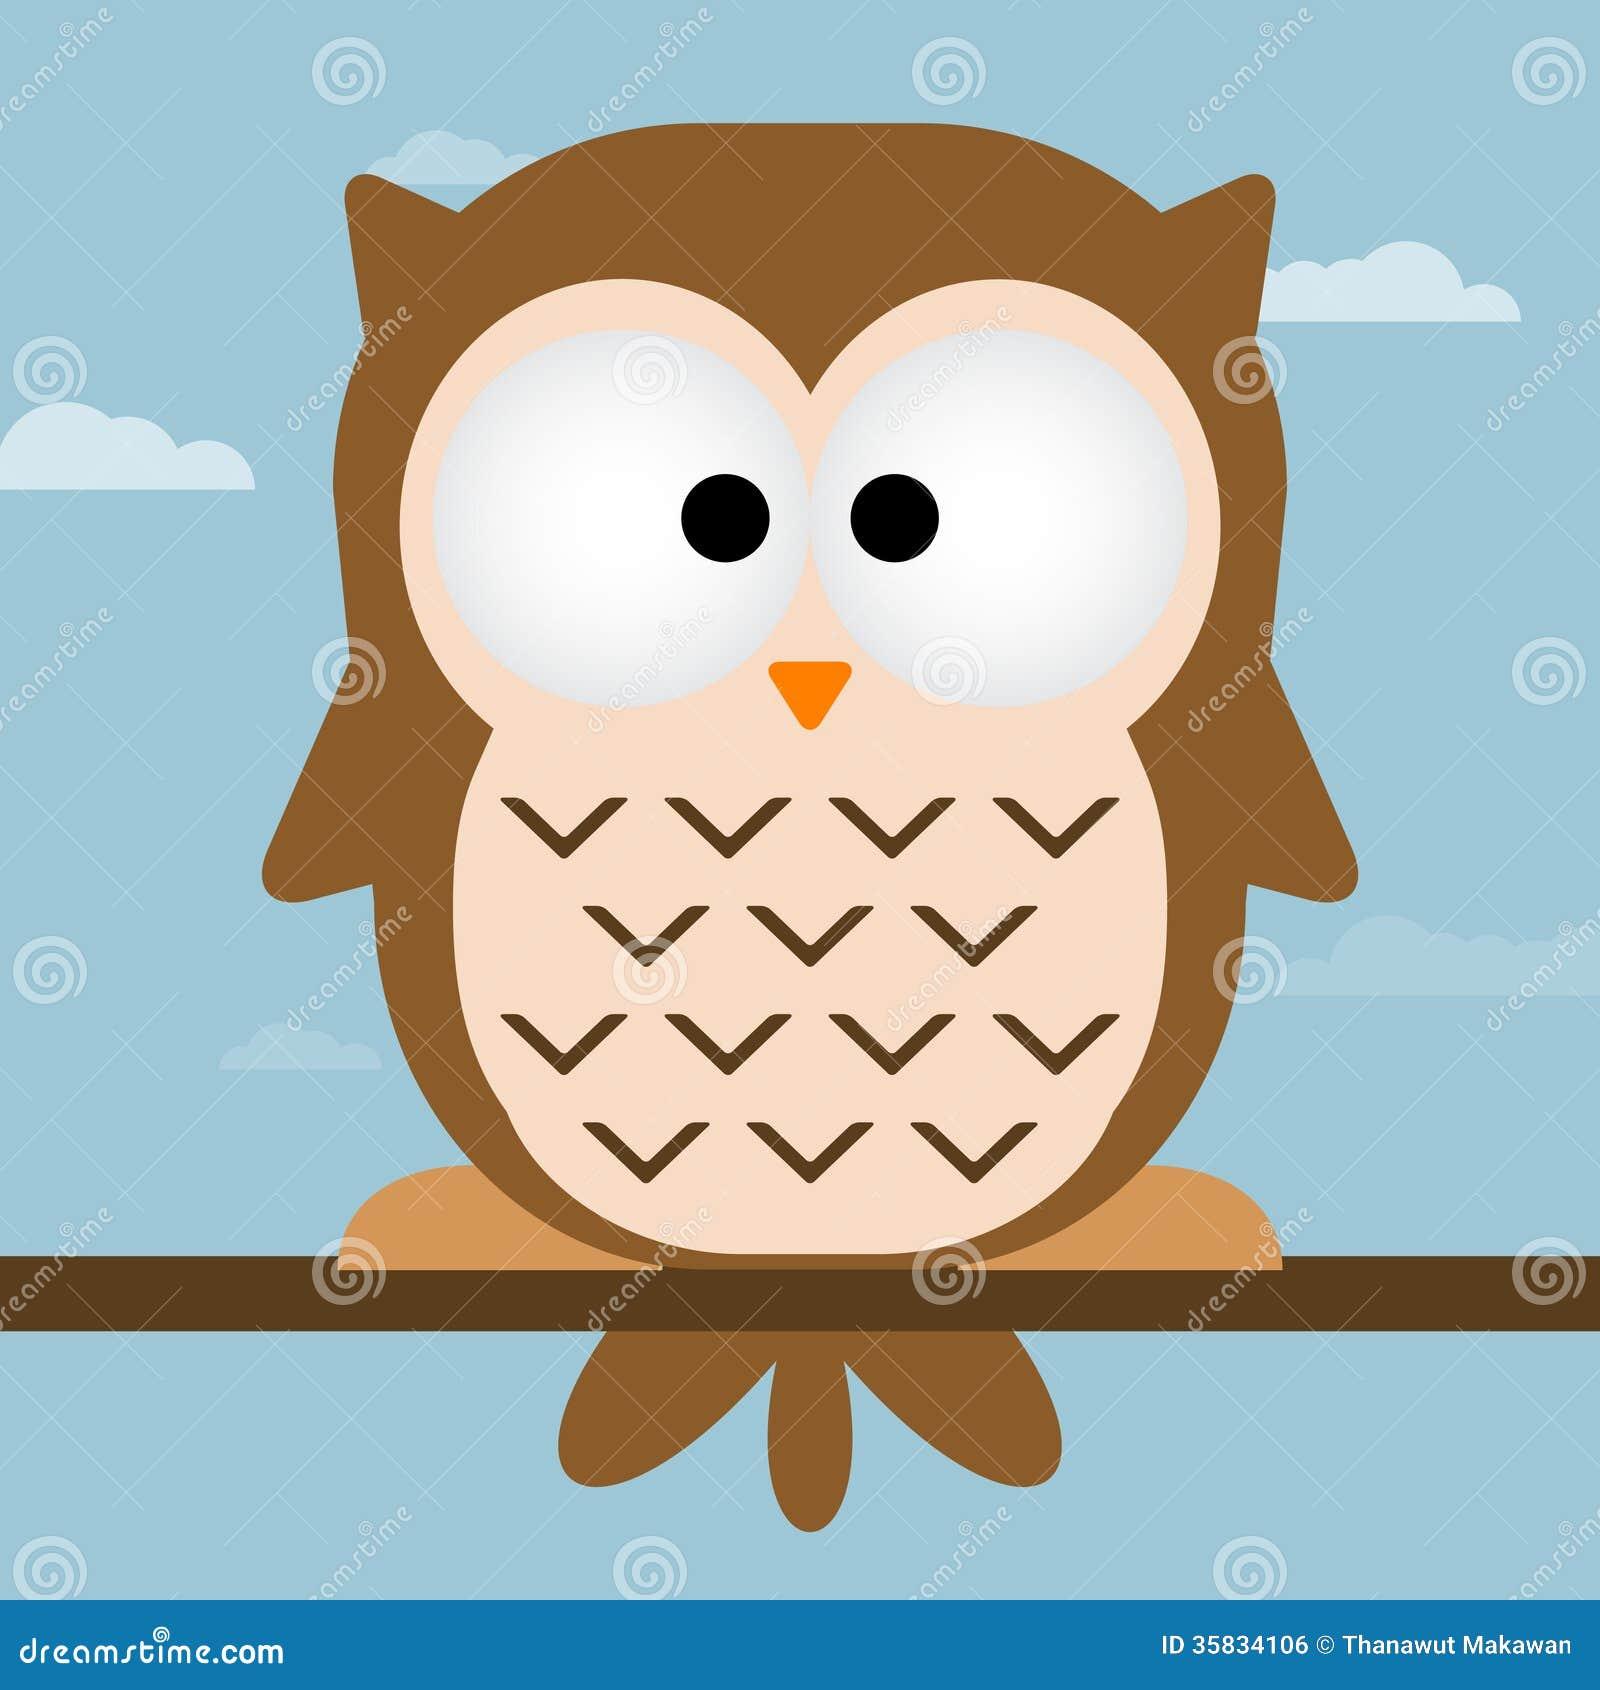 Cute owl illustration stock vector illustration of bird 35834106 cute owl illustration voltagebd Image collections